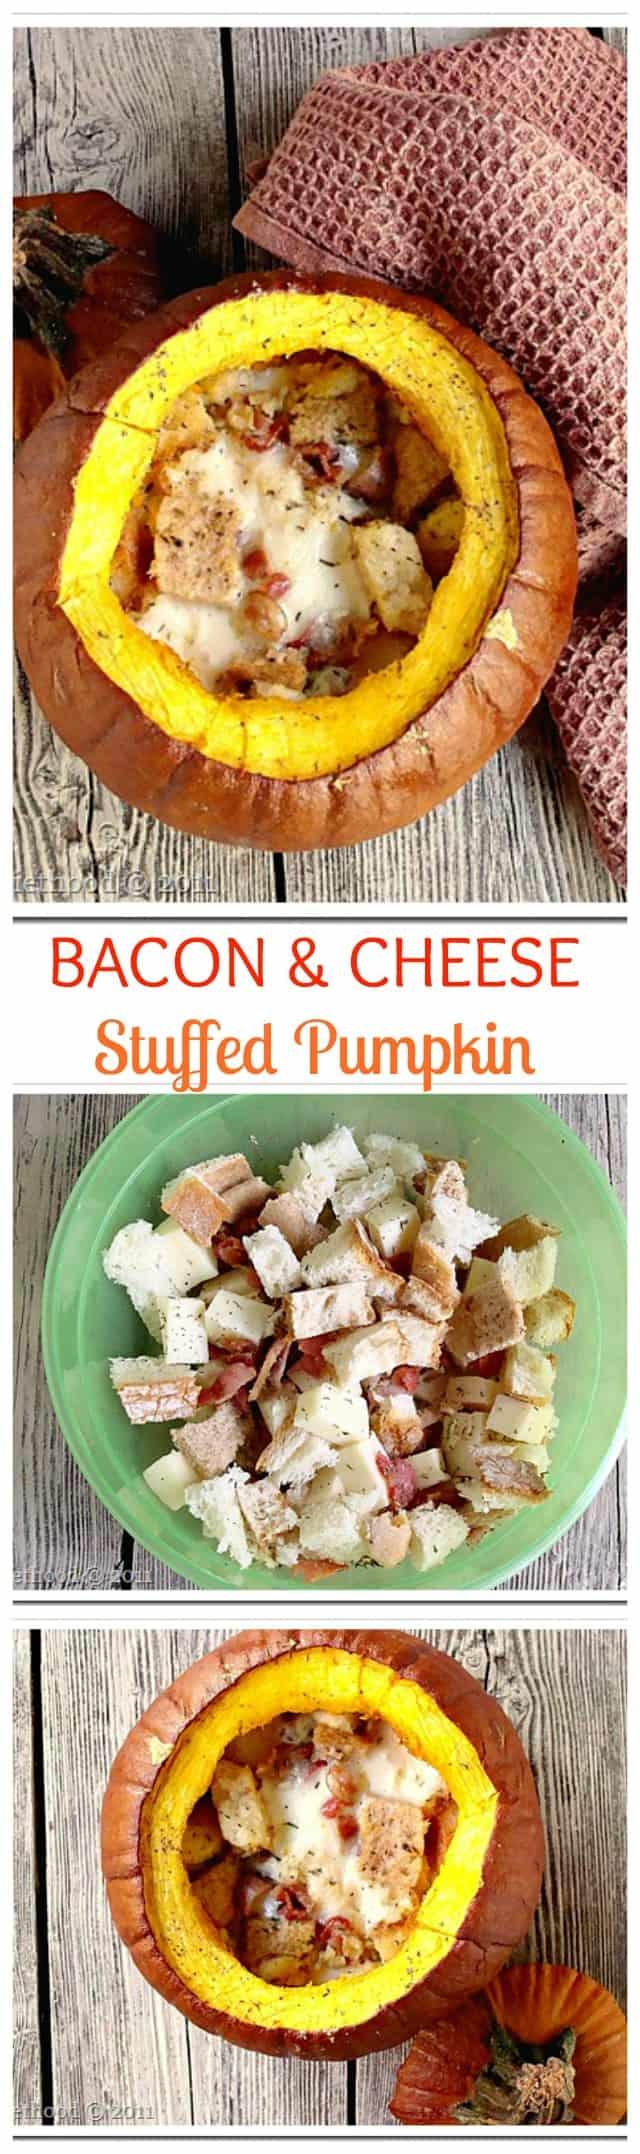 Bacon and Cheese Stuffed Pumpkin www.diethood.com